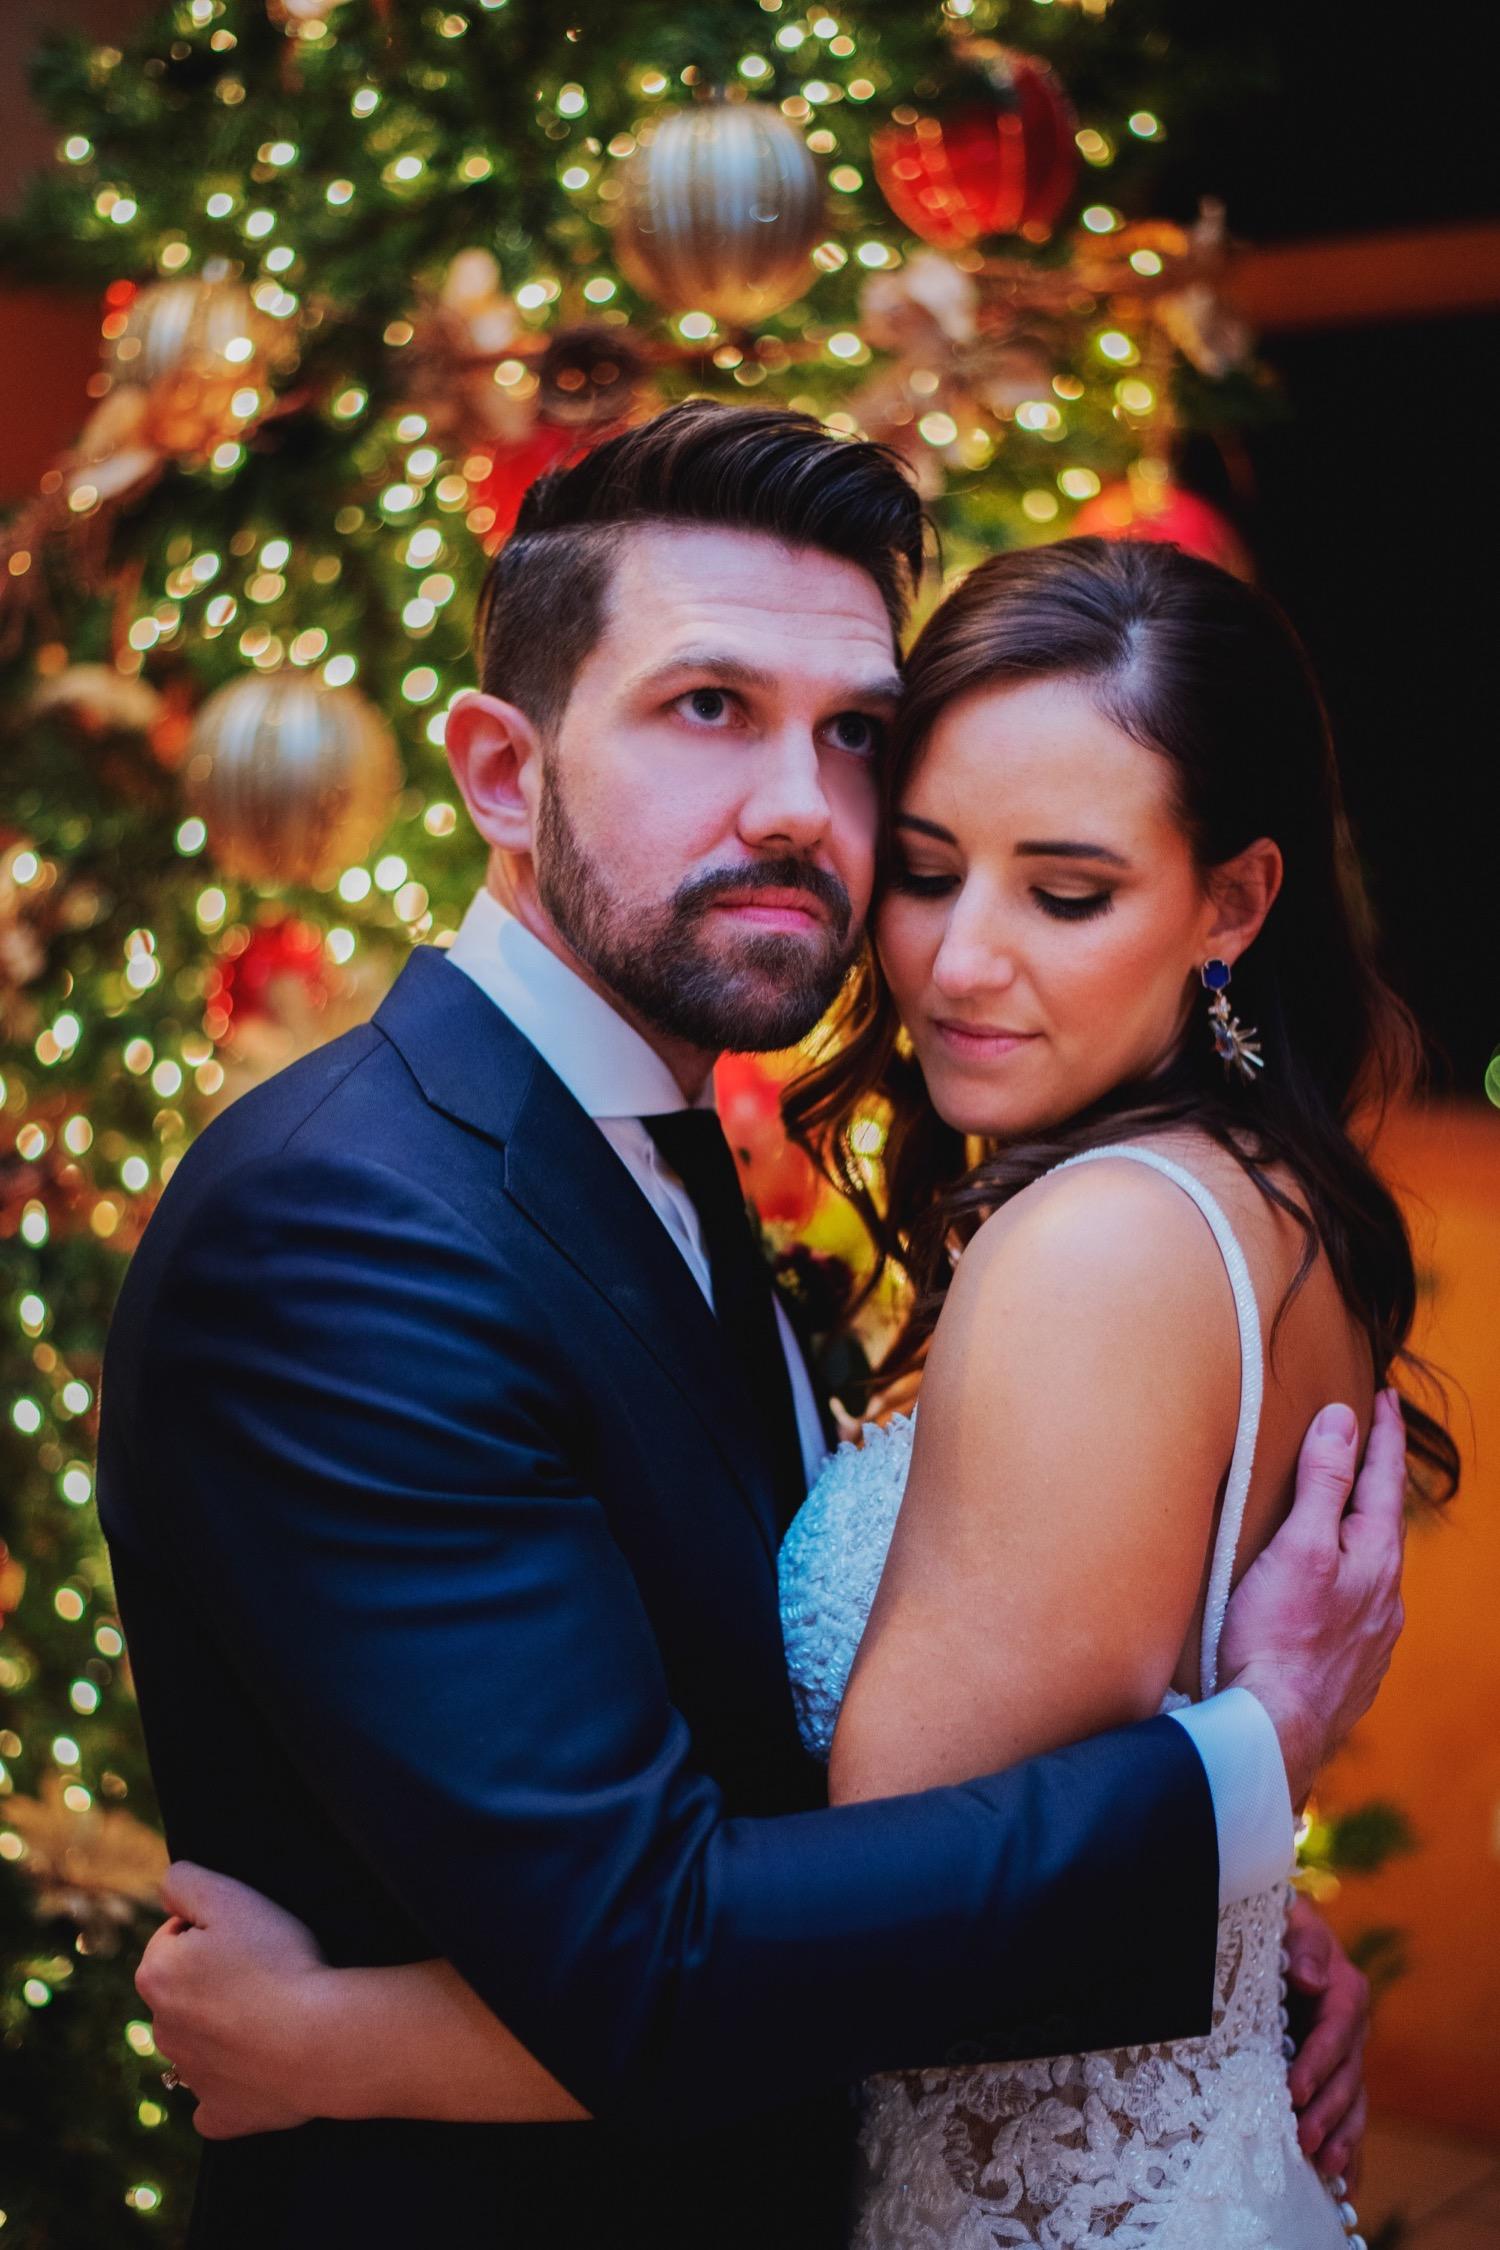 088_Haavig_Danada-Christmas-December-Wedding_0154_DanadaHouse_DanadaHouseWedding_ChicagoSuburbWedding_Chicagowedding.jpg